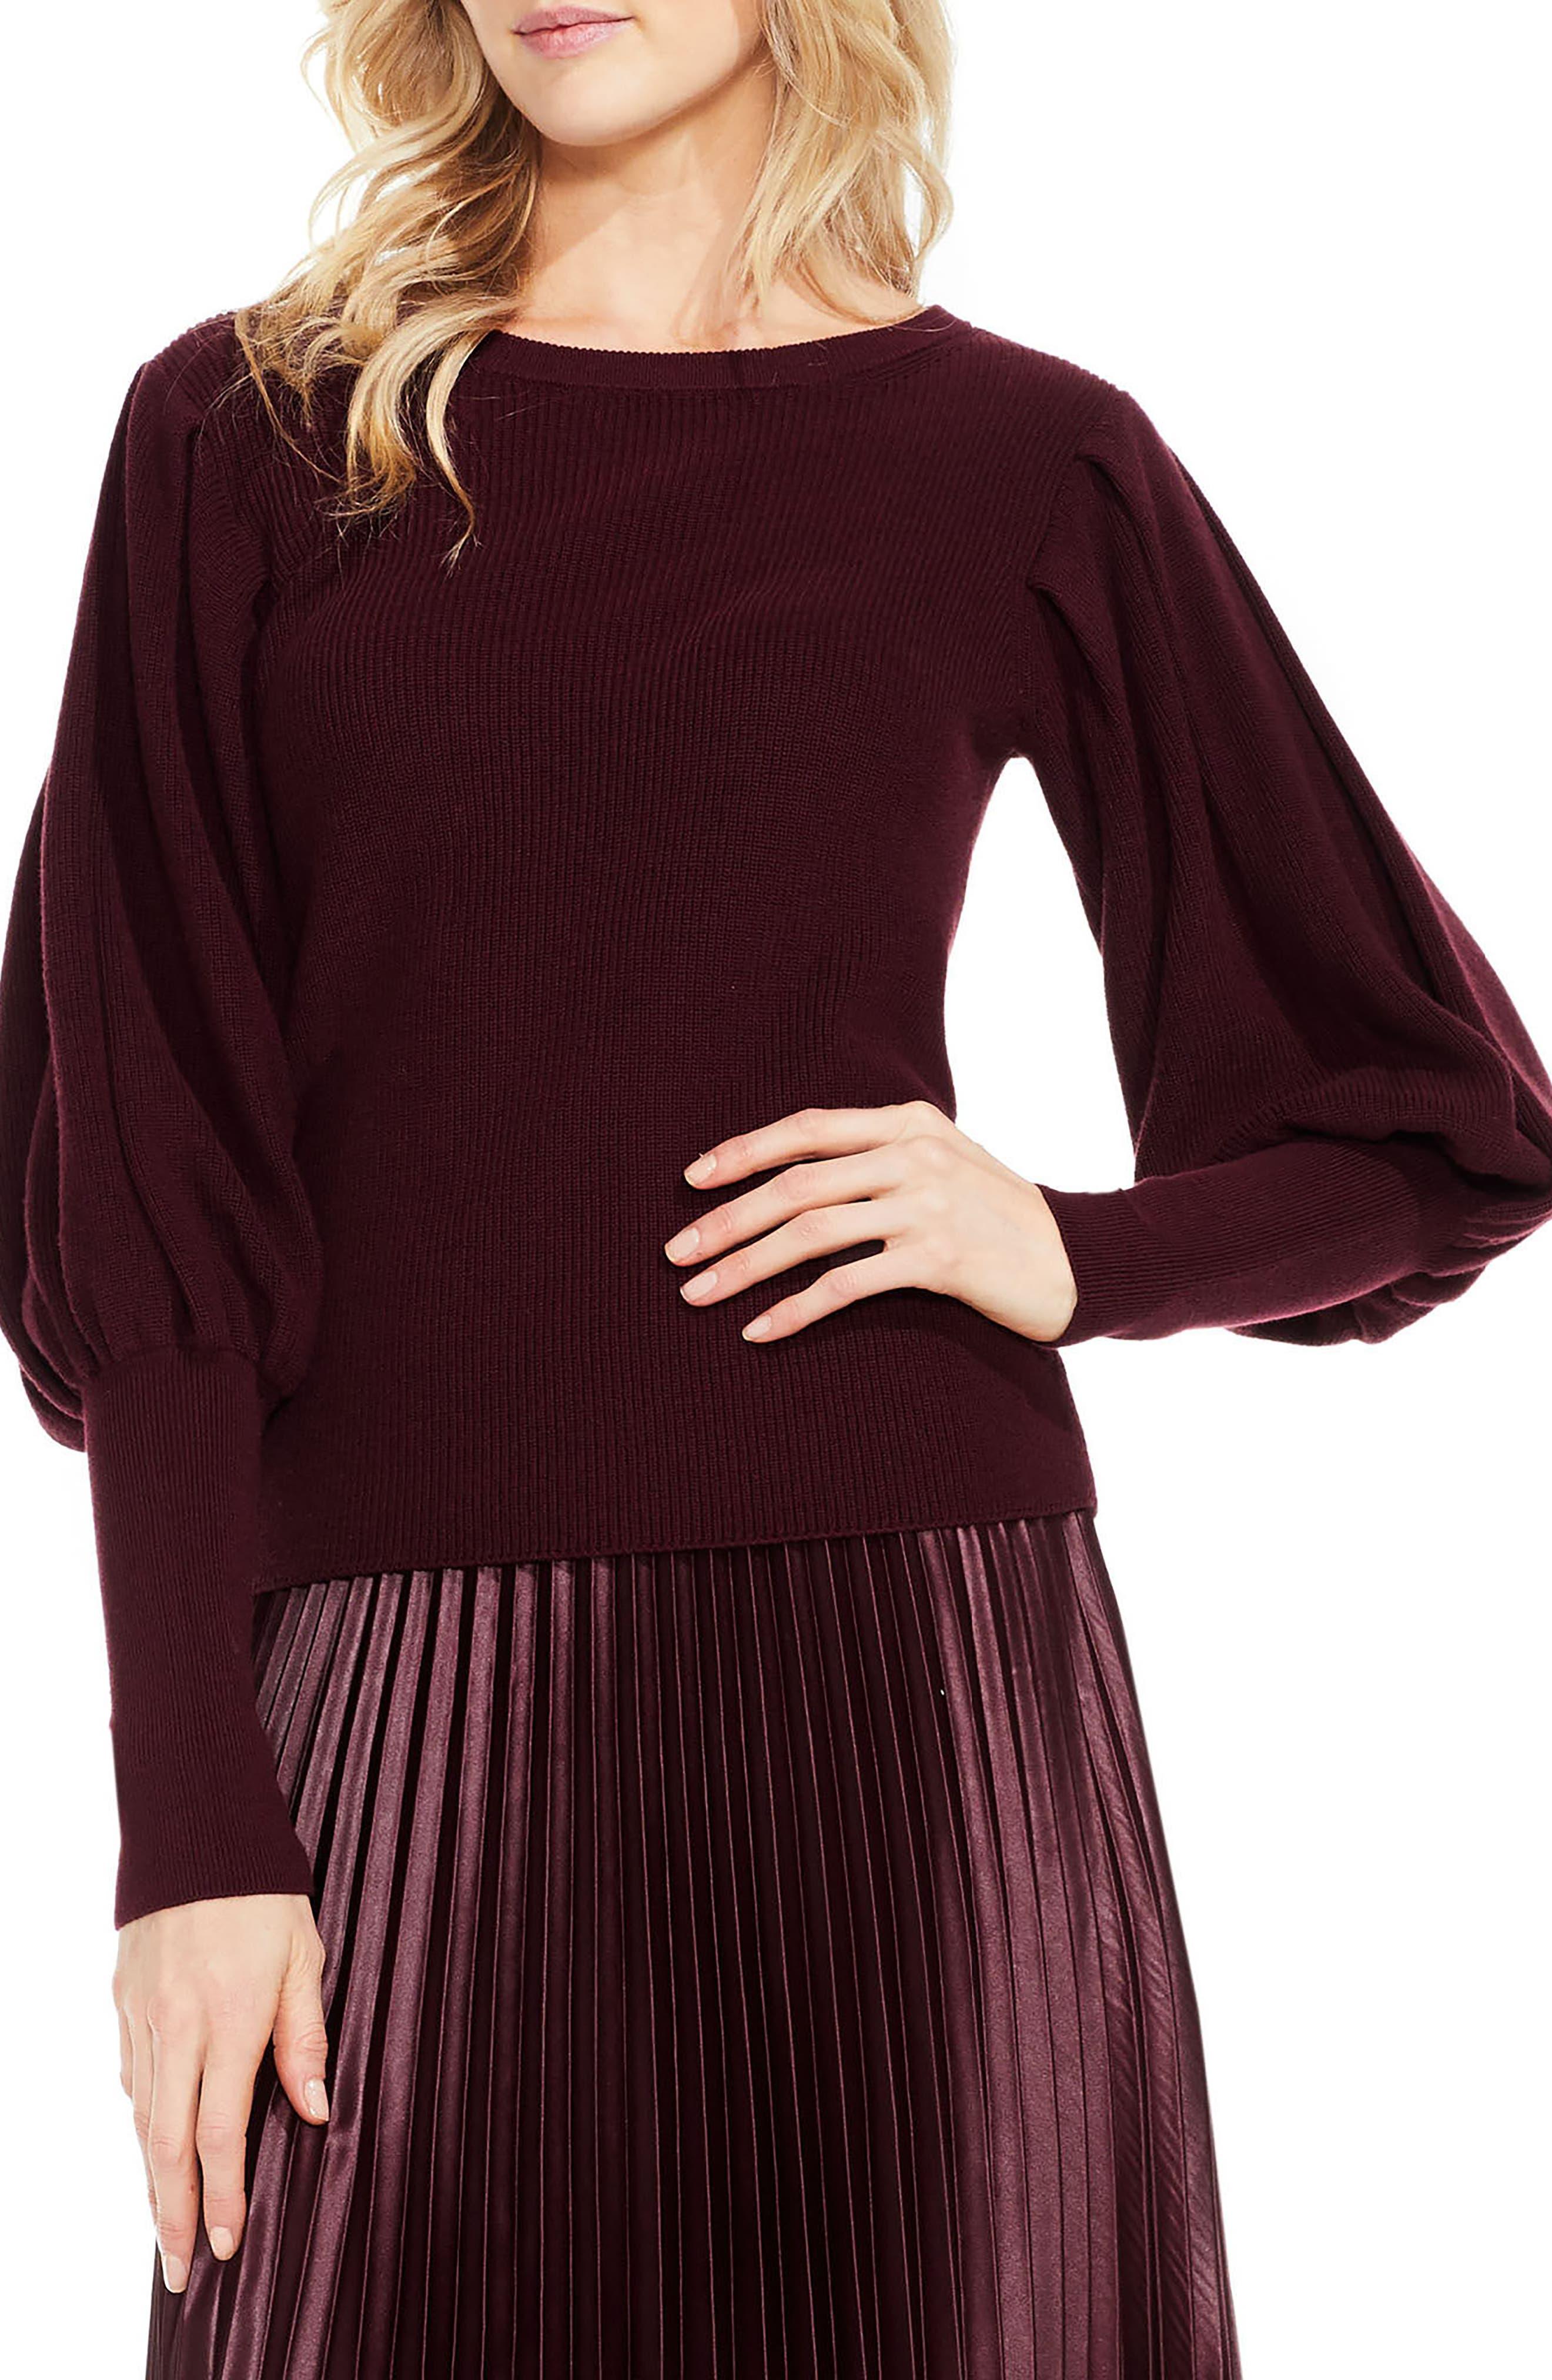 Alternate Image 1 Selected - Vince Camuto Bubble Sleeve Sweater (Regular & Petite)